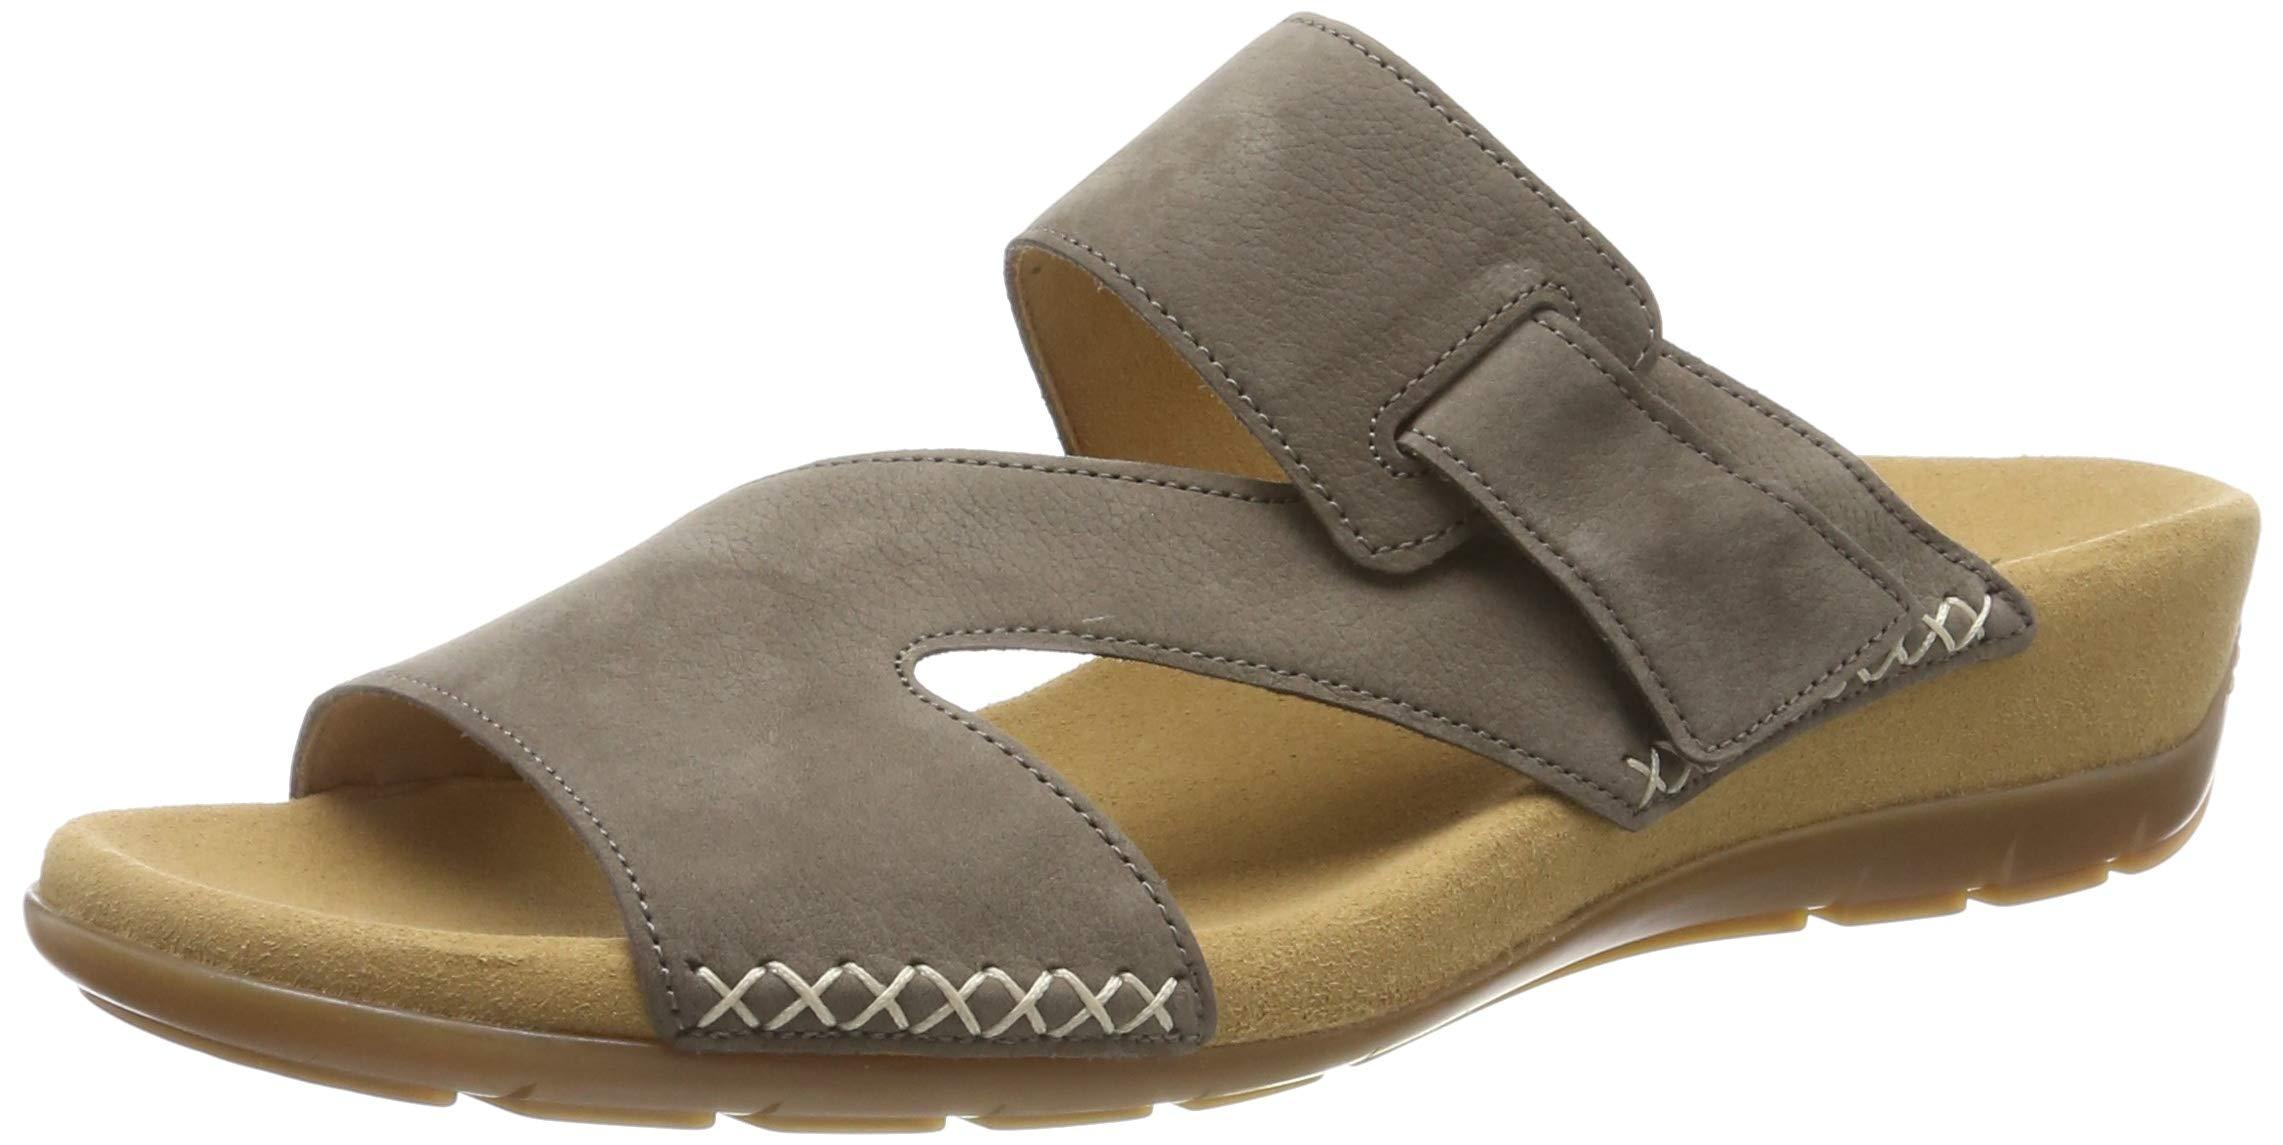 Shoes JollysMules 1343 Gabor Eu FemmeMarronwallaby 8w0PnOkX